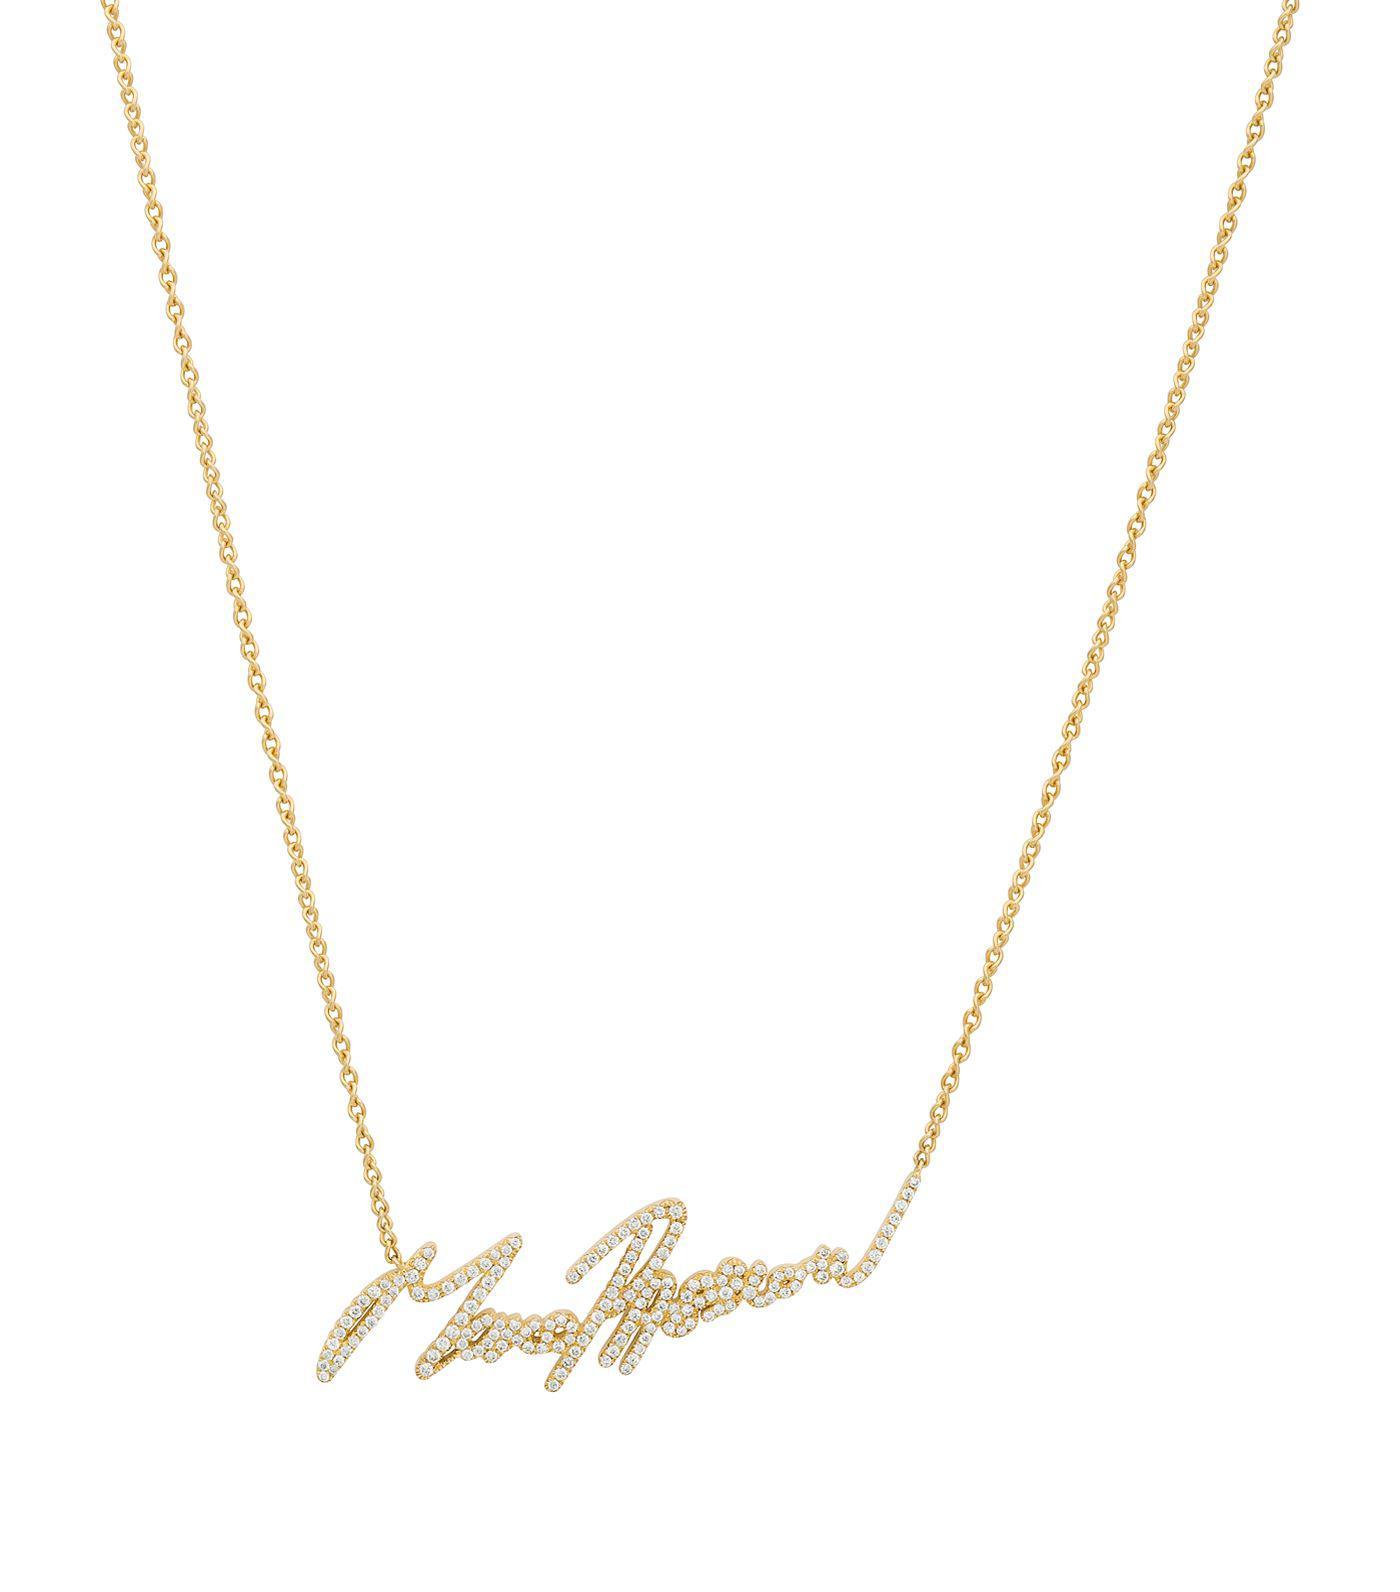 Stephen Webster Kiss Diamond Pendant Necklace in 18K Yellow Gold hXmPLCBTX